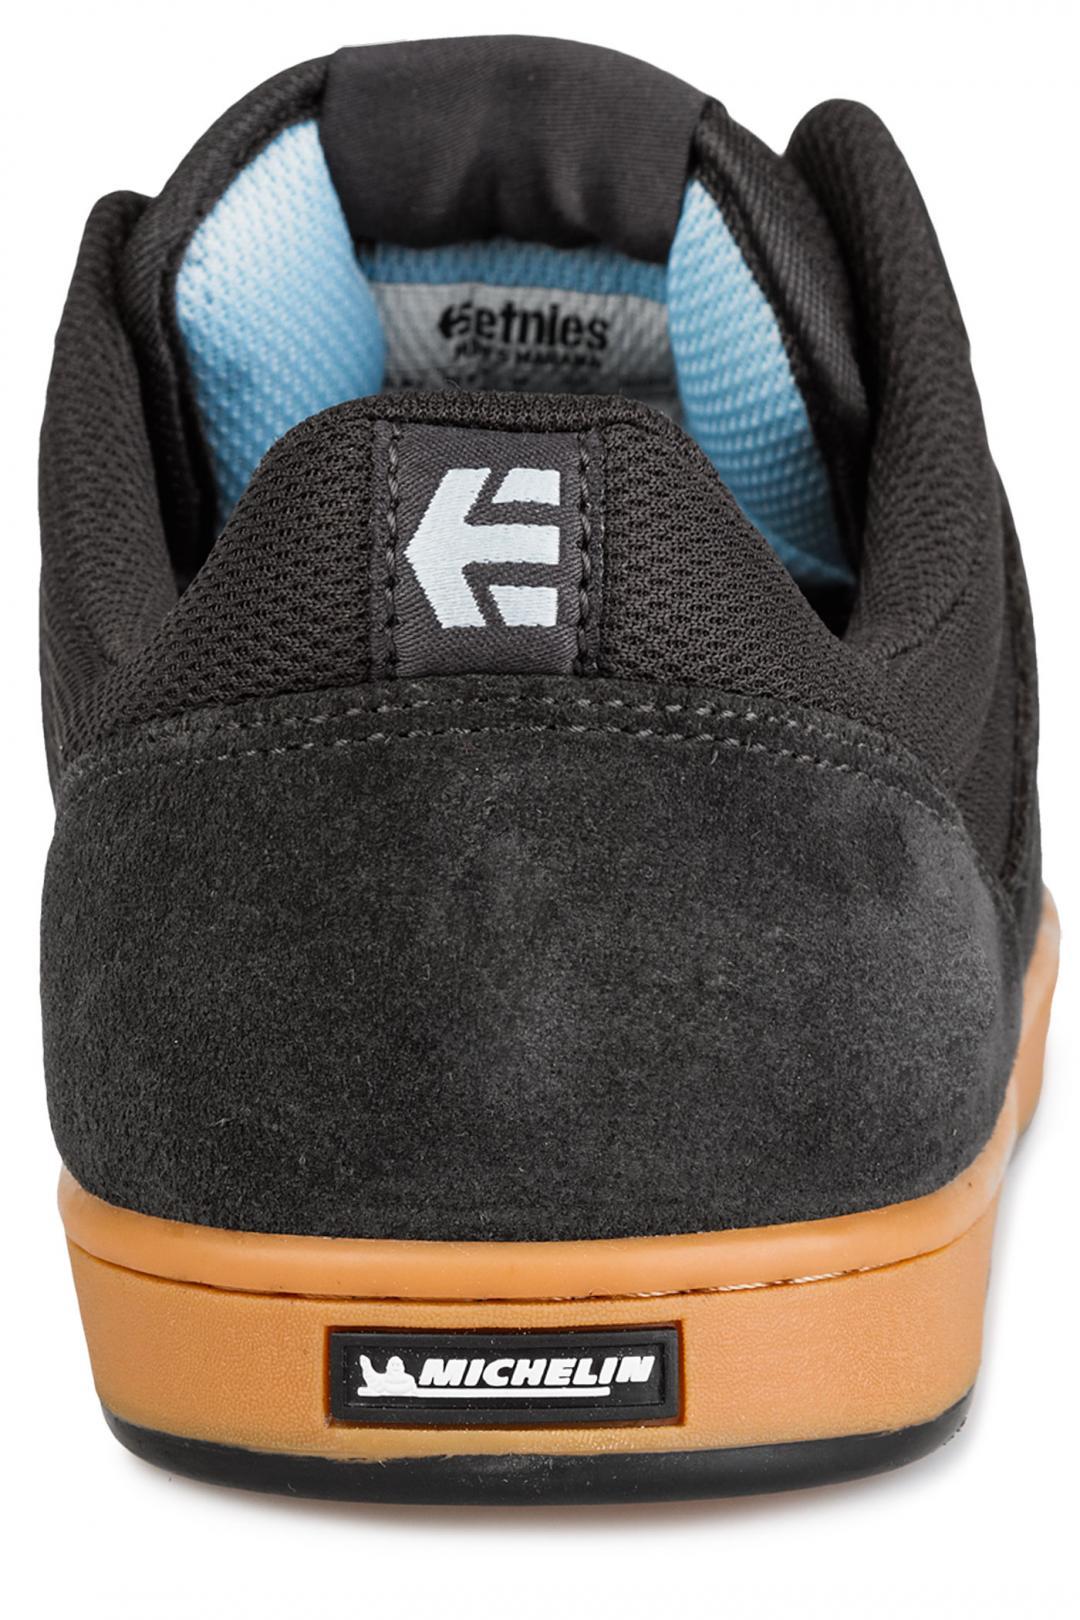 Uomo Etnies Marana dark grey blue | Scarpe da skate